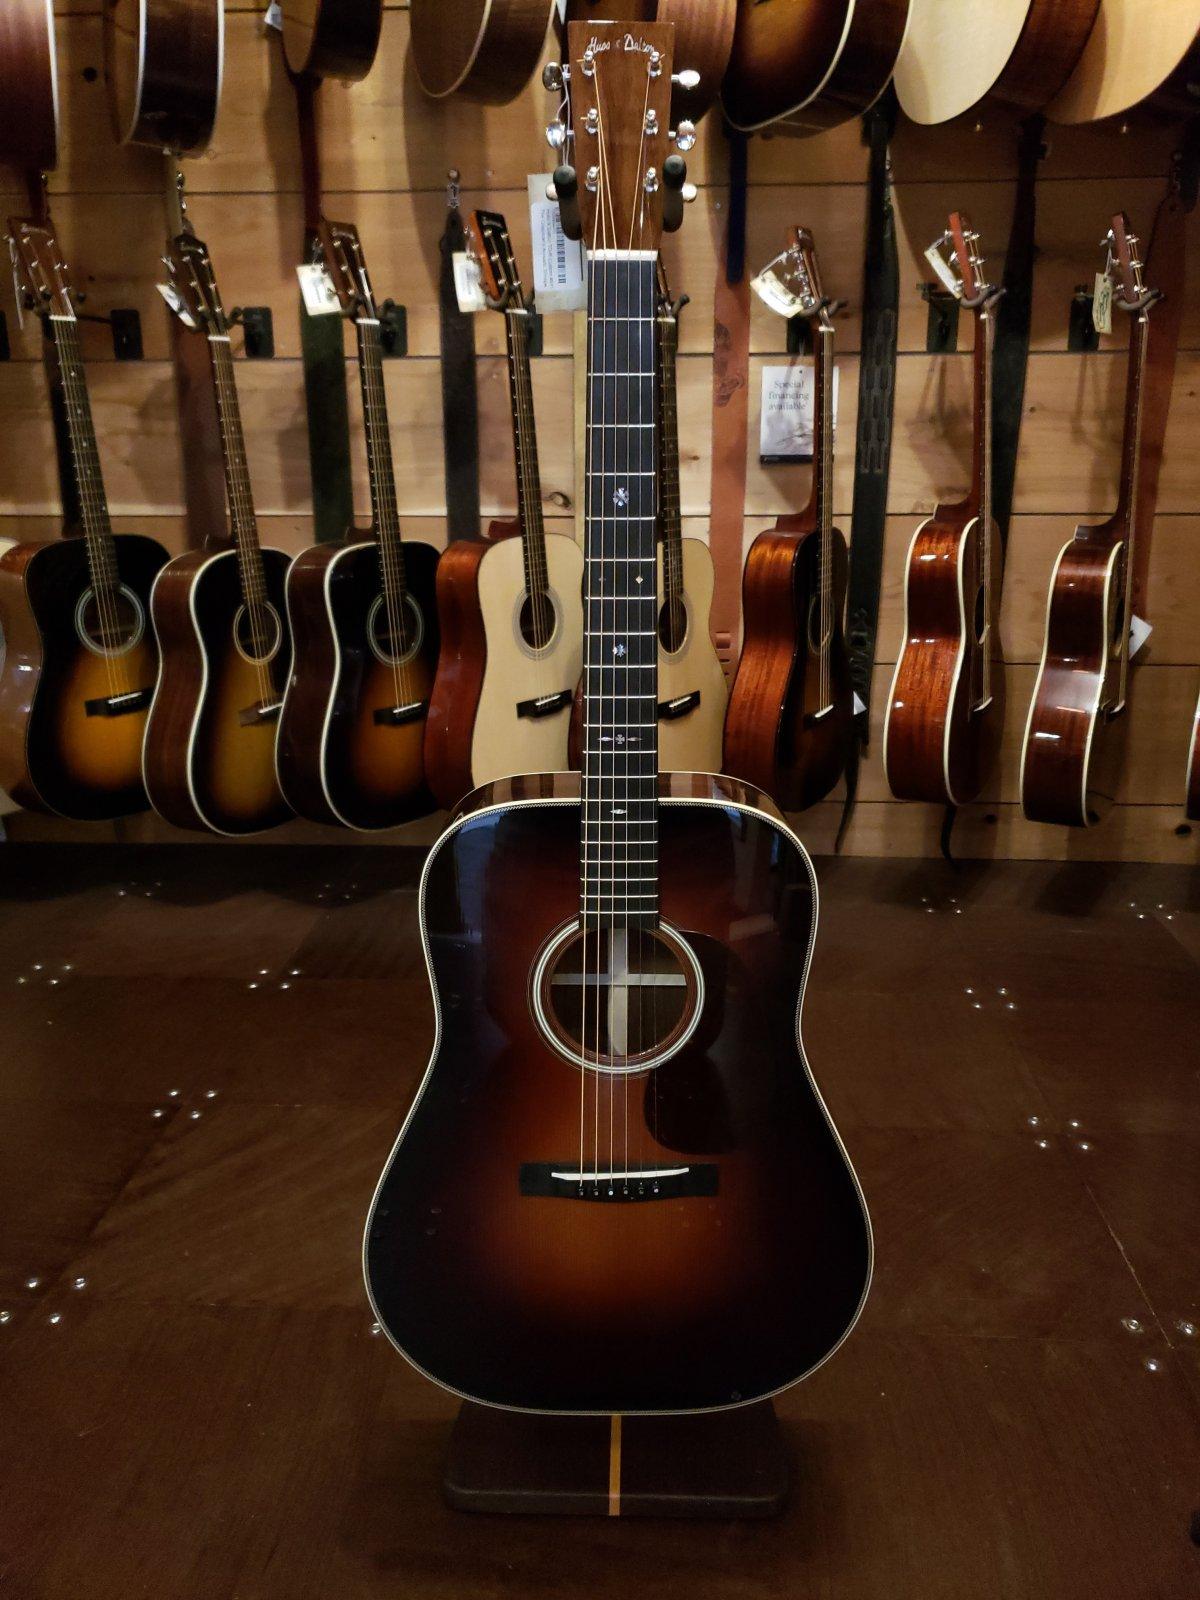 huss and dalton guitar finish